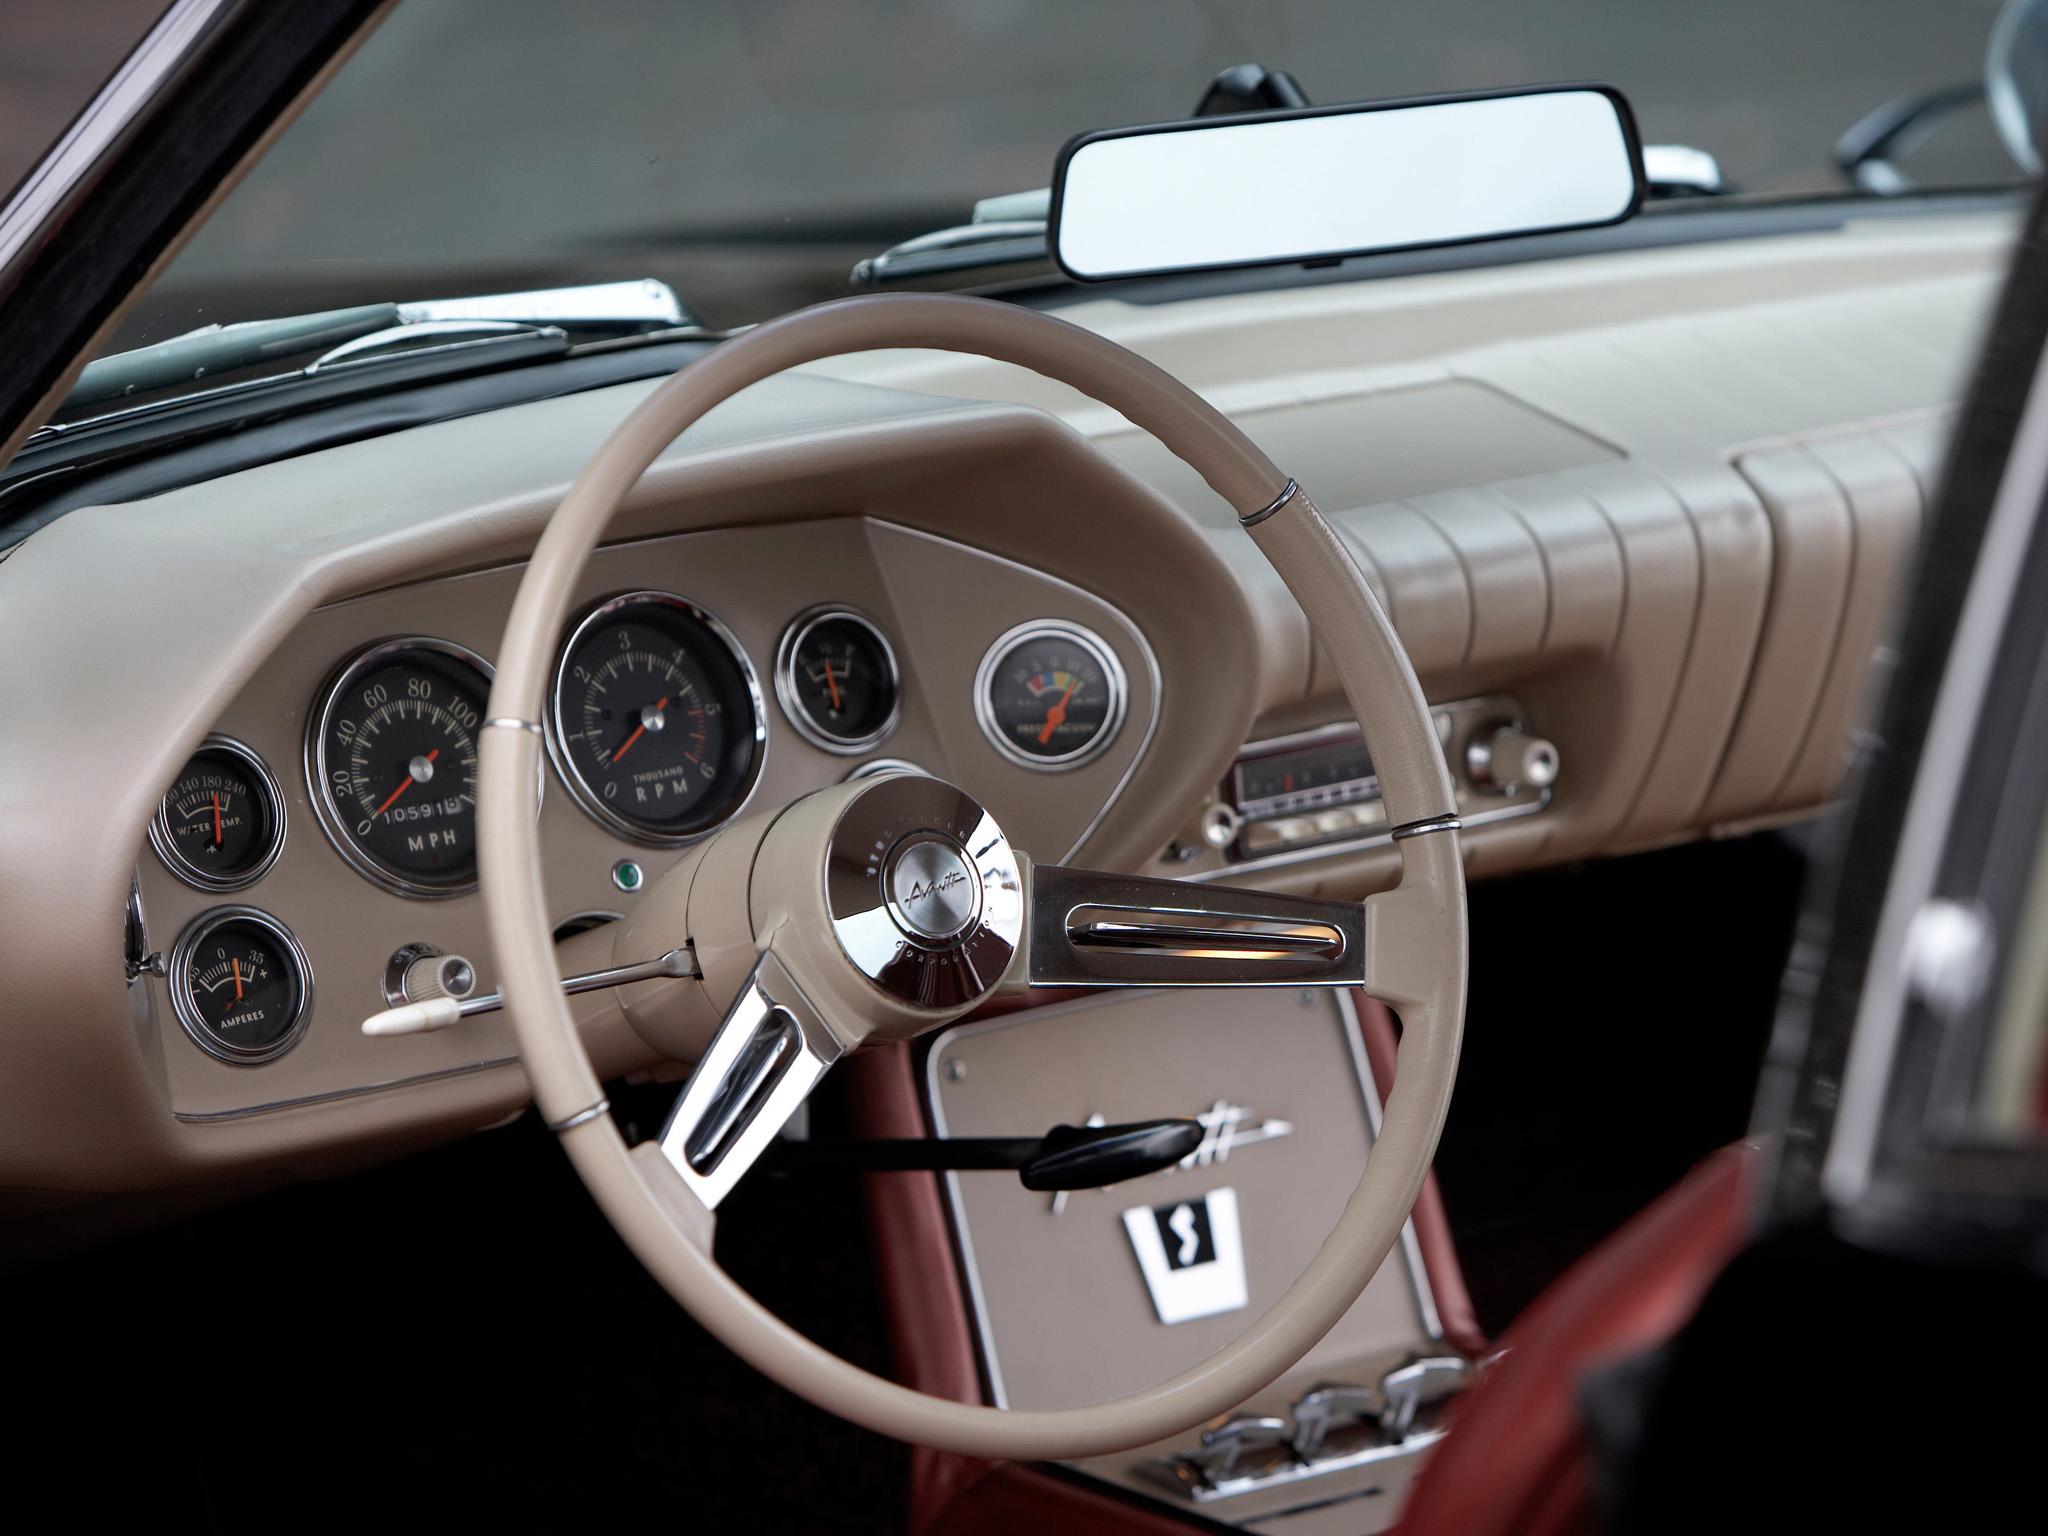 studebaker avanti 1962 1963 studebaker avanti 1962 1963 photo 01 car in pictures car photo. Black Bedroom Furniture Sets. Home Design Ideas